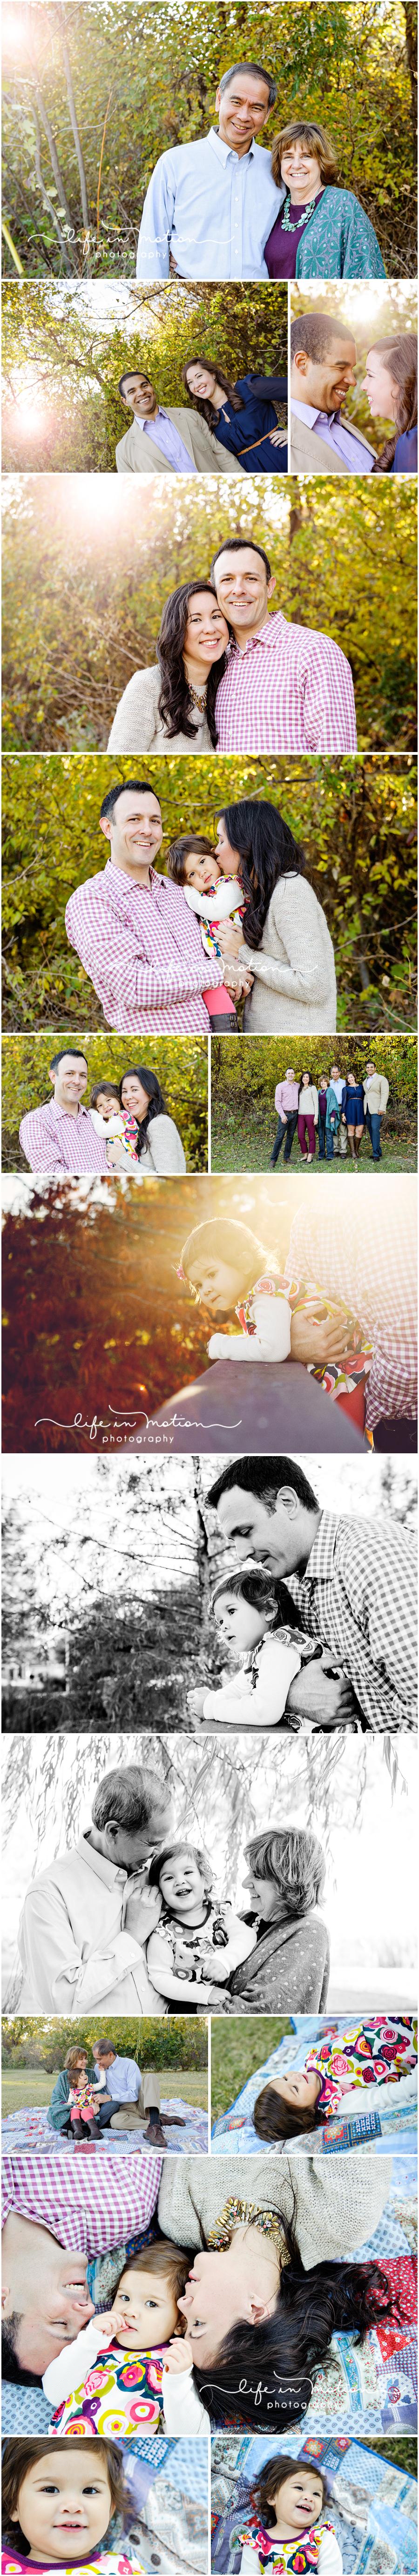 family_photographers_austin